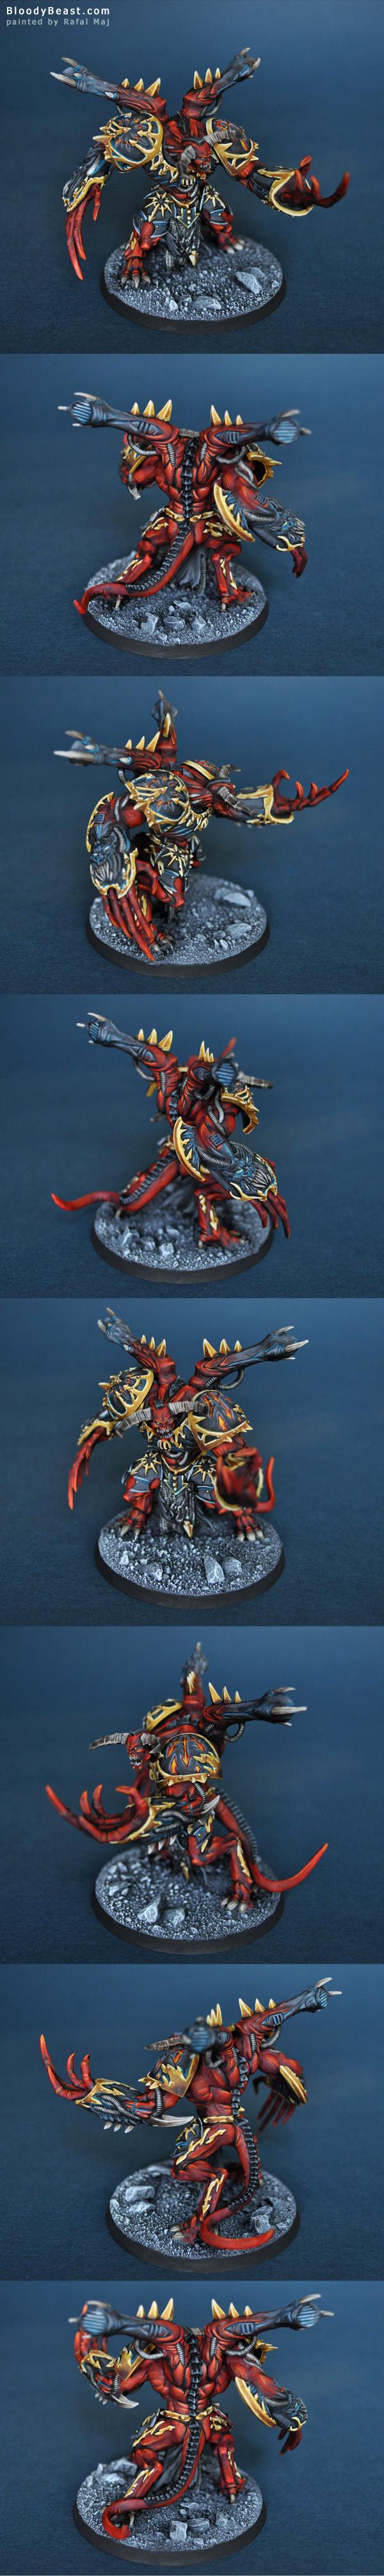 Chaos Daemon Prince painted by Rafal Maj (BloodyBeast.com)